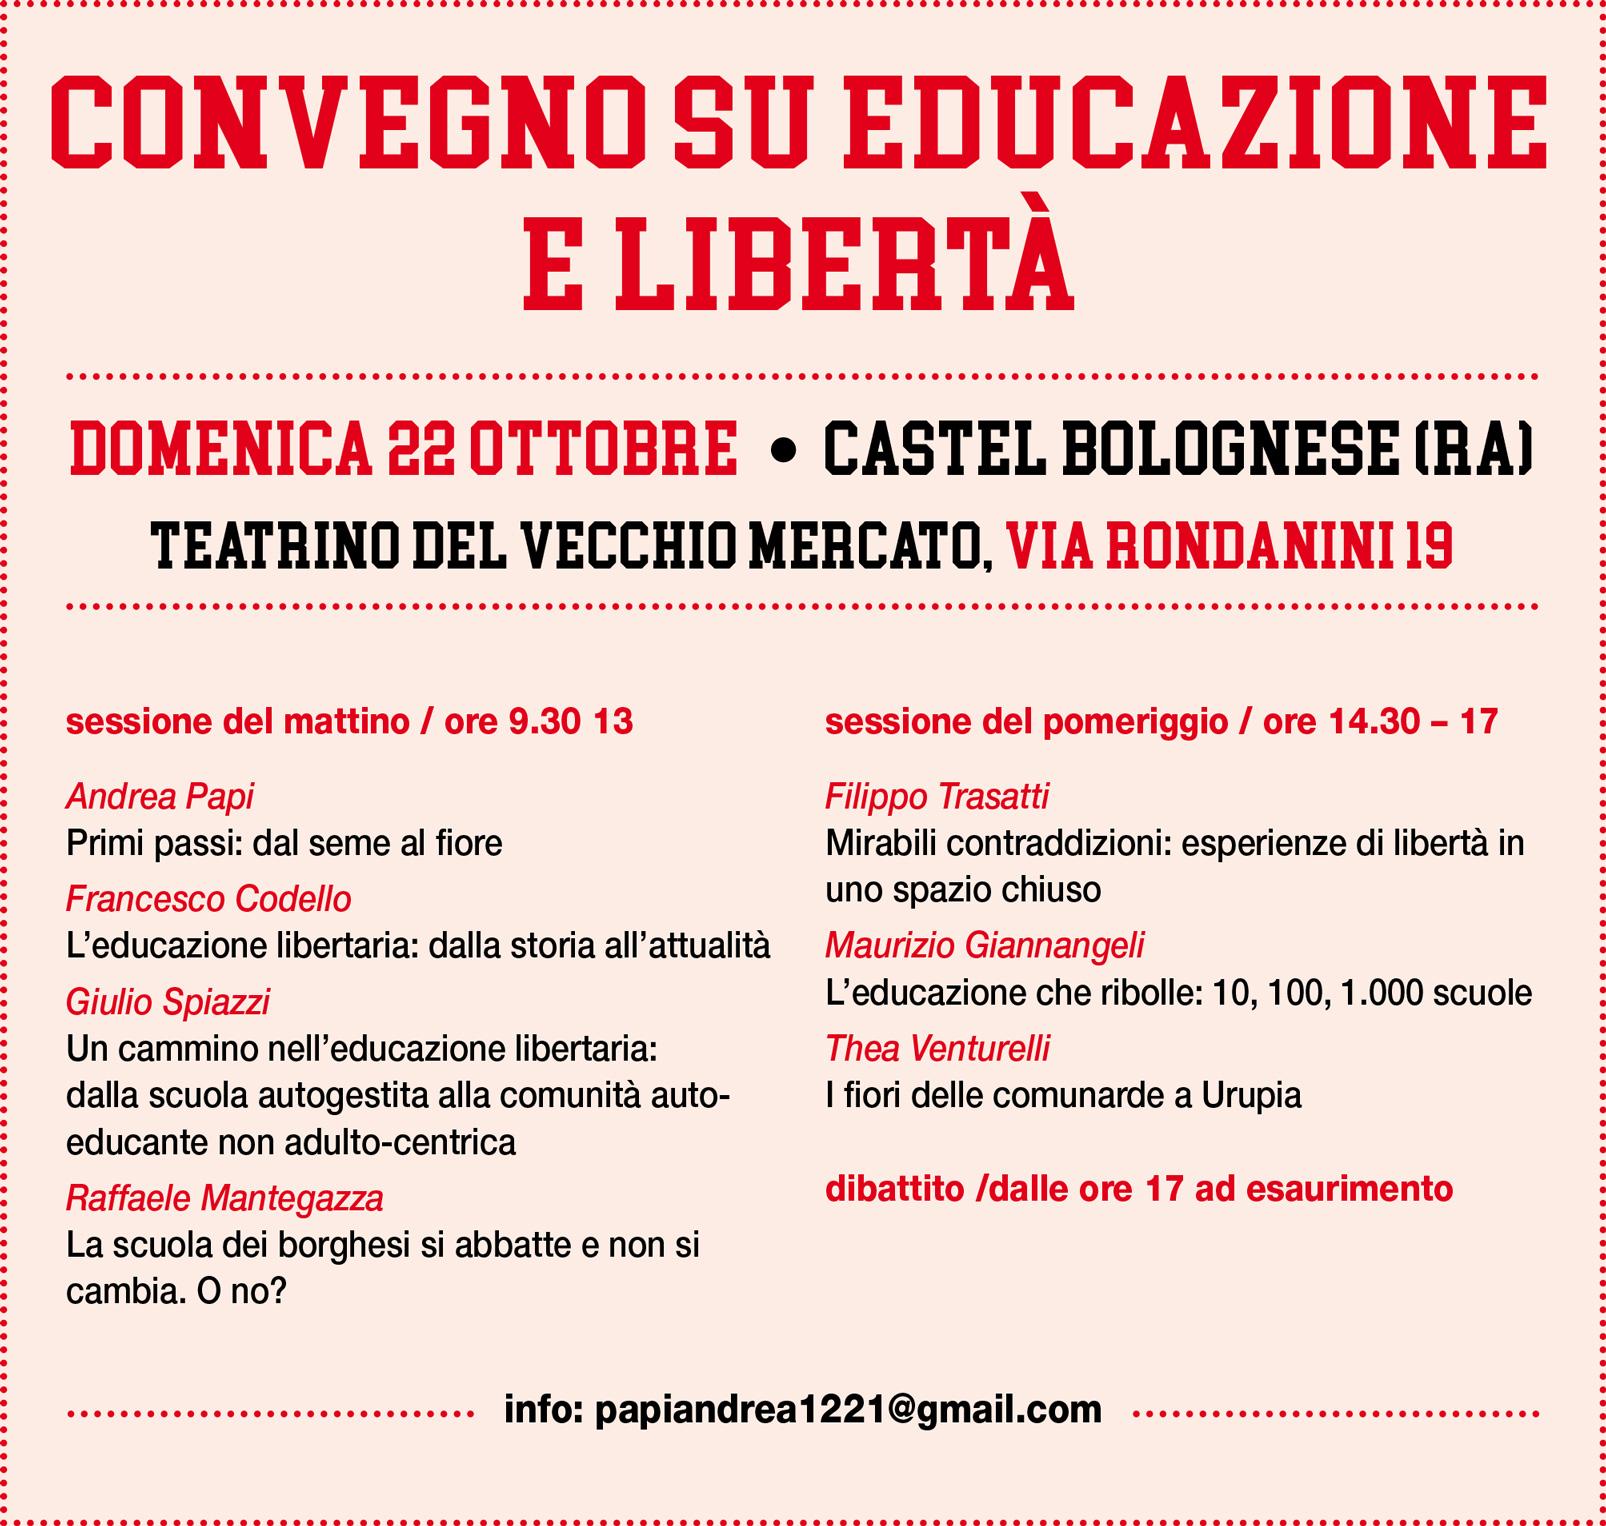 Convegno_Castel_Bolognese